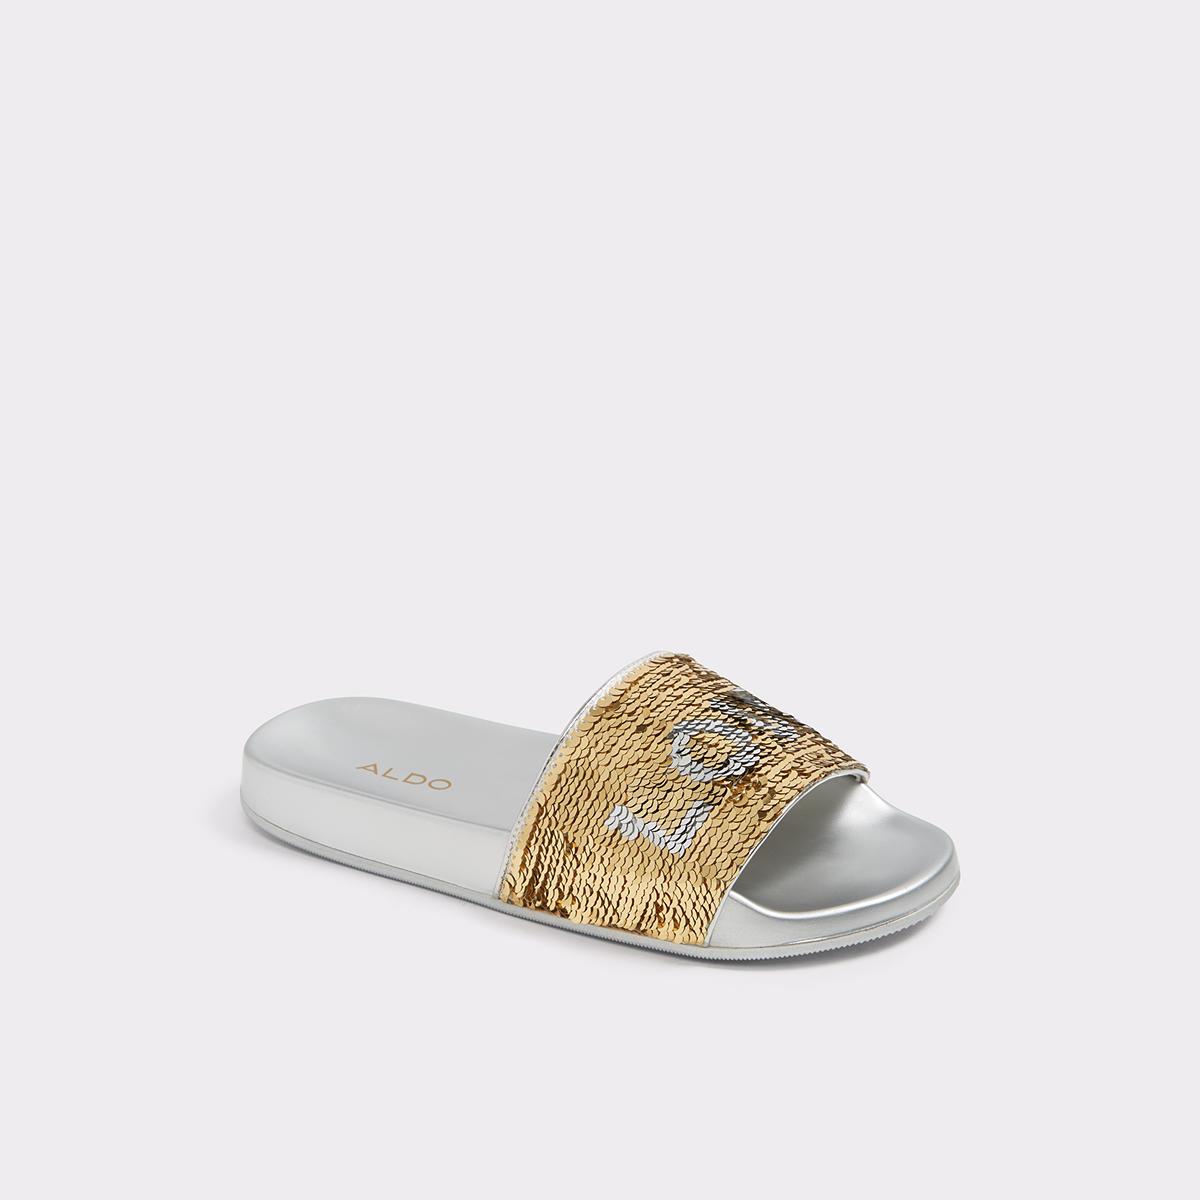 Buy ALDO Sunrize Sandals Online on United States AL087SH0RYH8MY